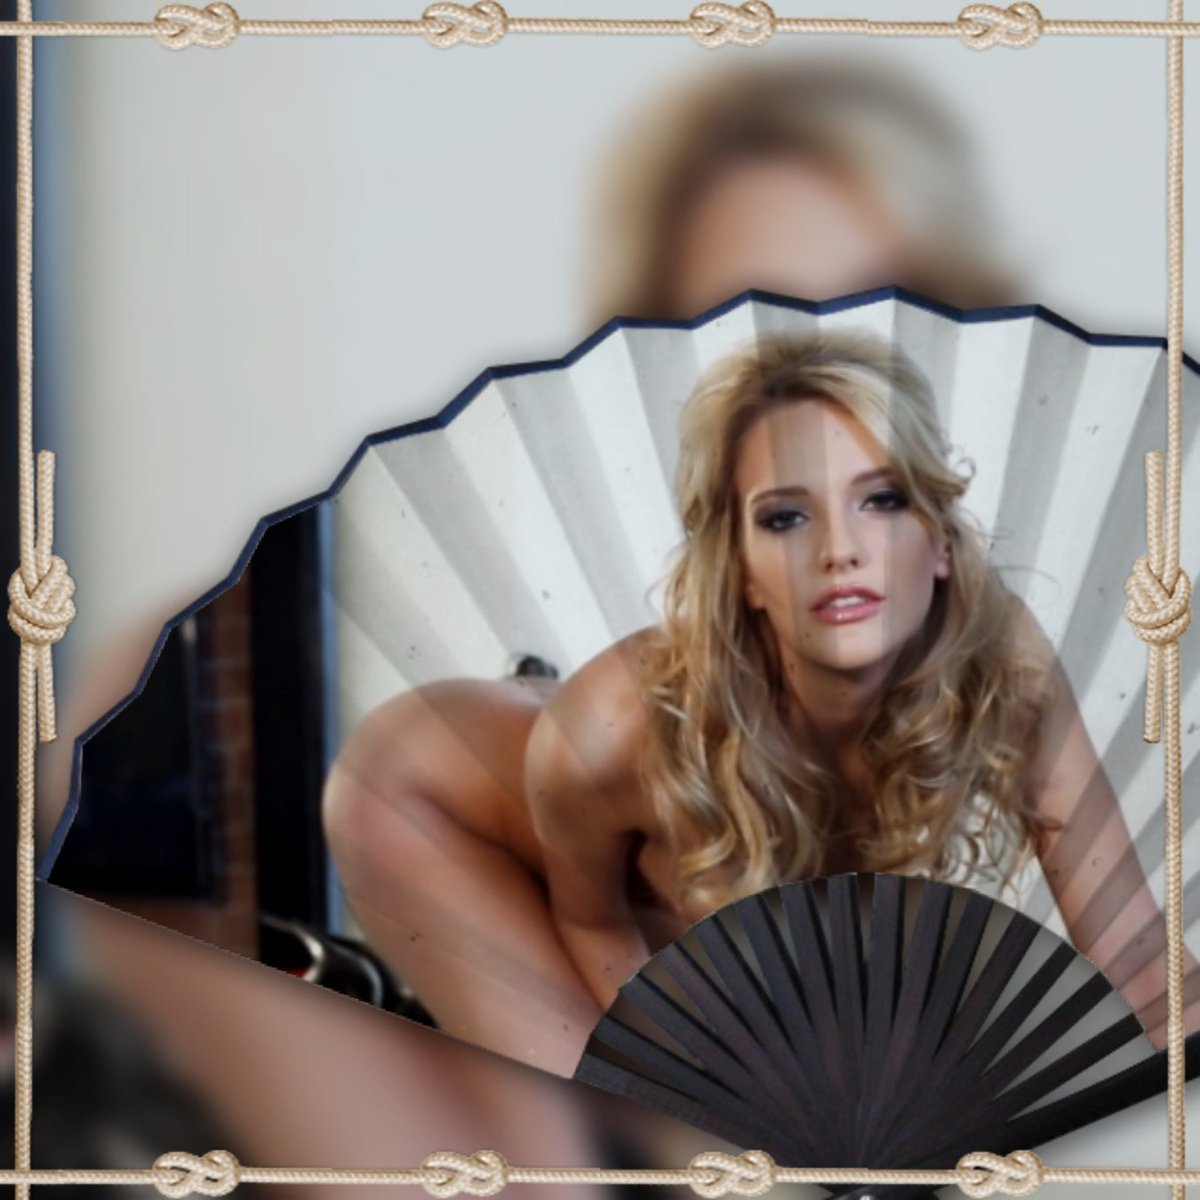 kenna james  u2022 exclusive interview  u2022 xczech com  u2022 online erotic magazine